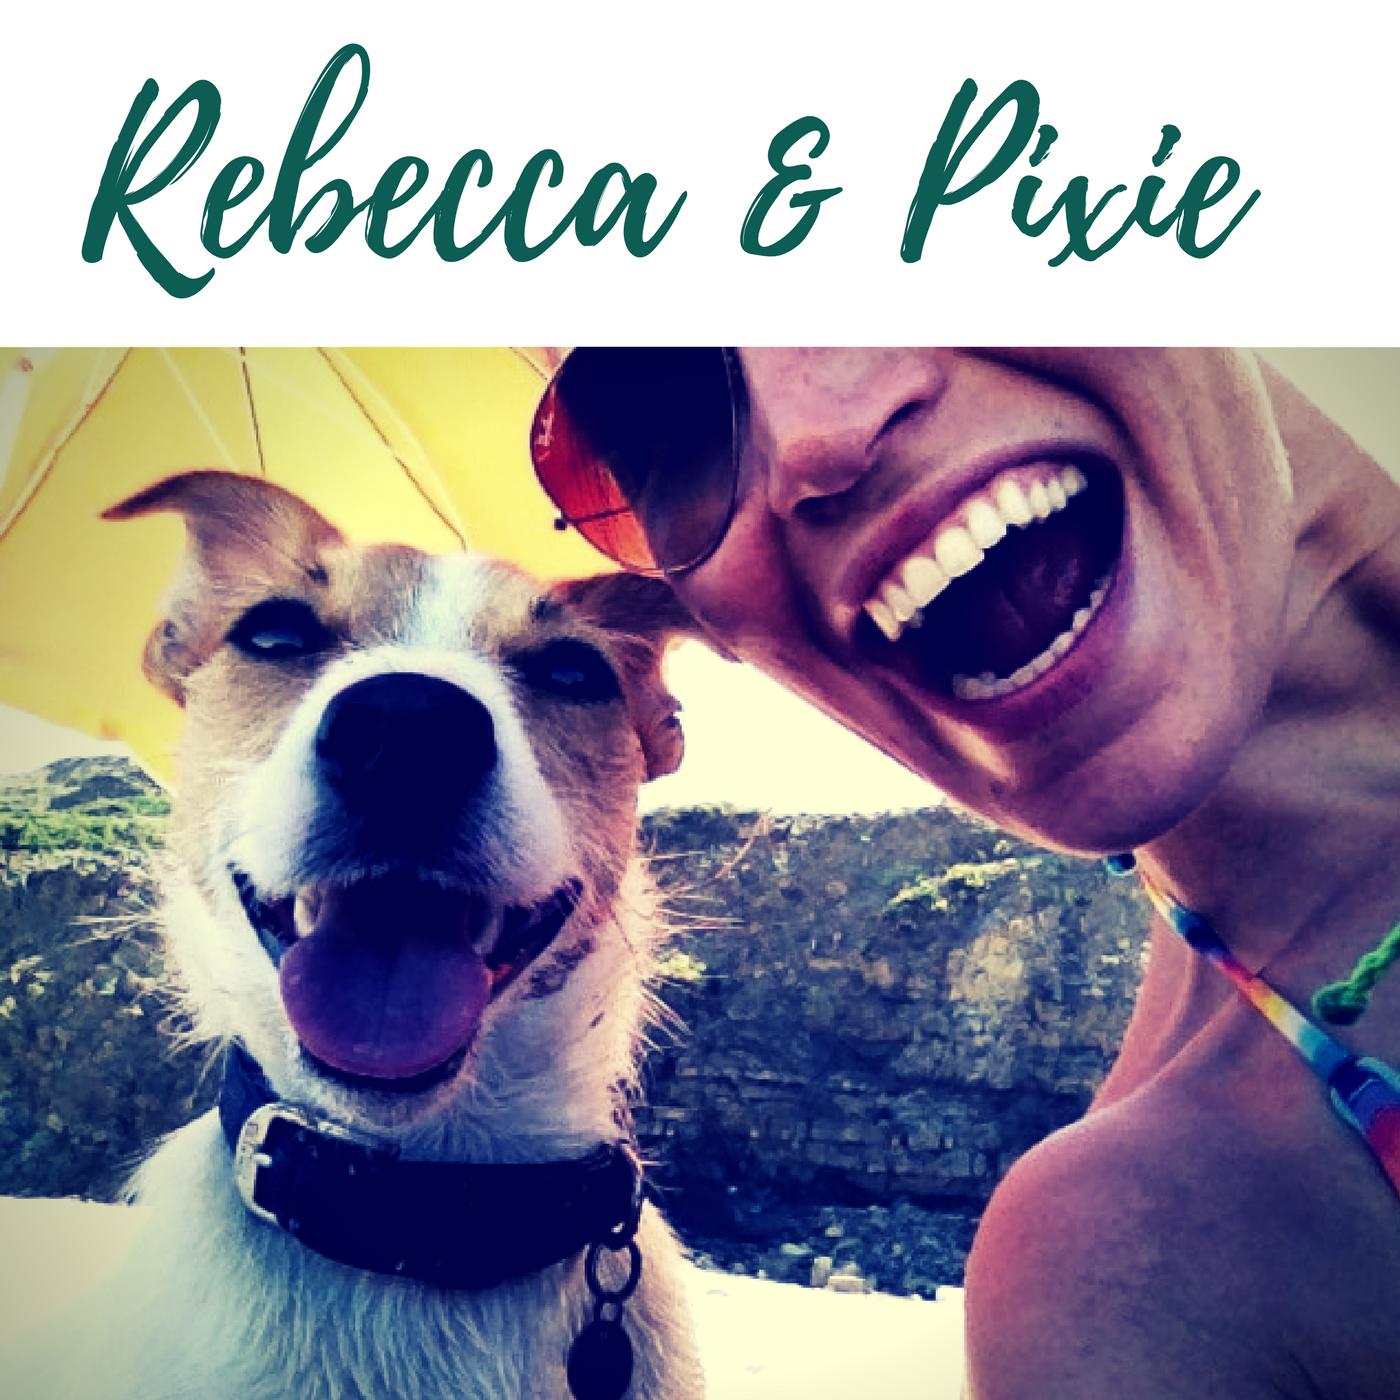 Rebecca und Pixie